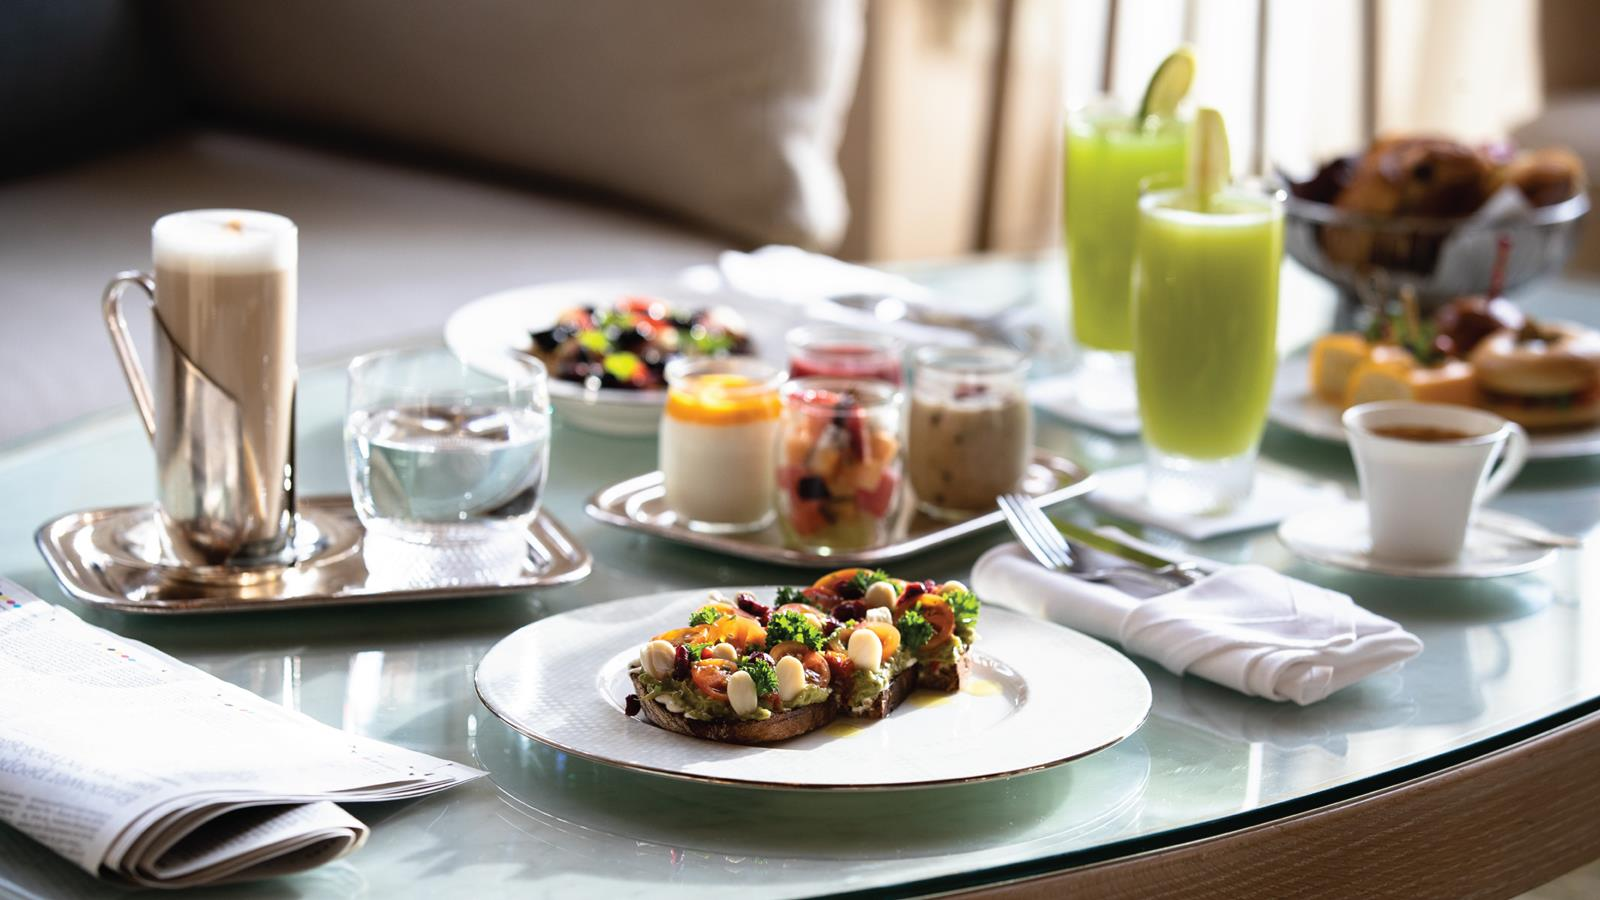 jumeirah-al-naseem-al-mandhar-lounge-food-spread2-hero.jpg